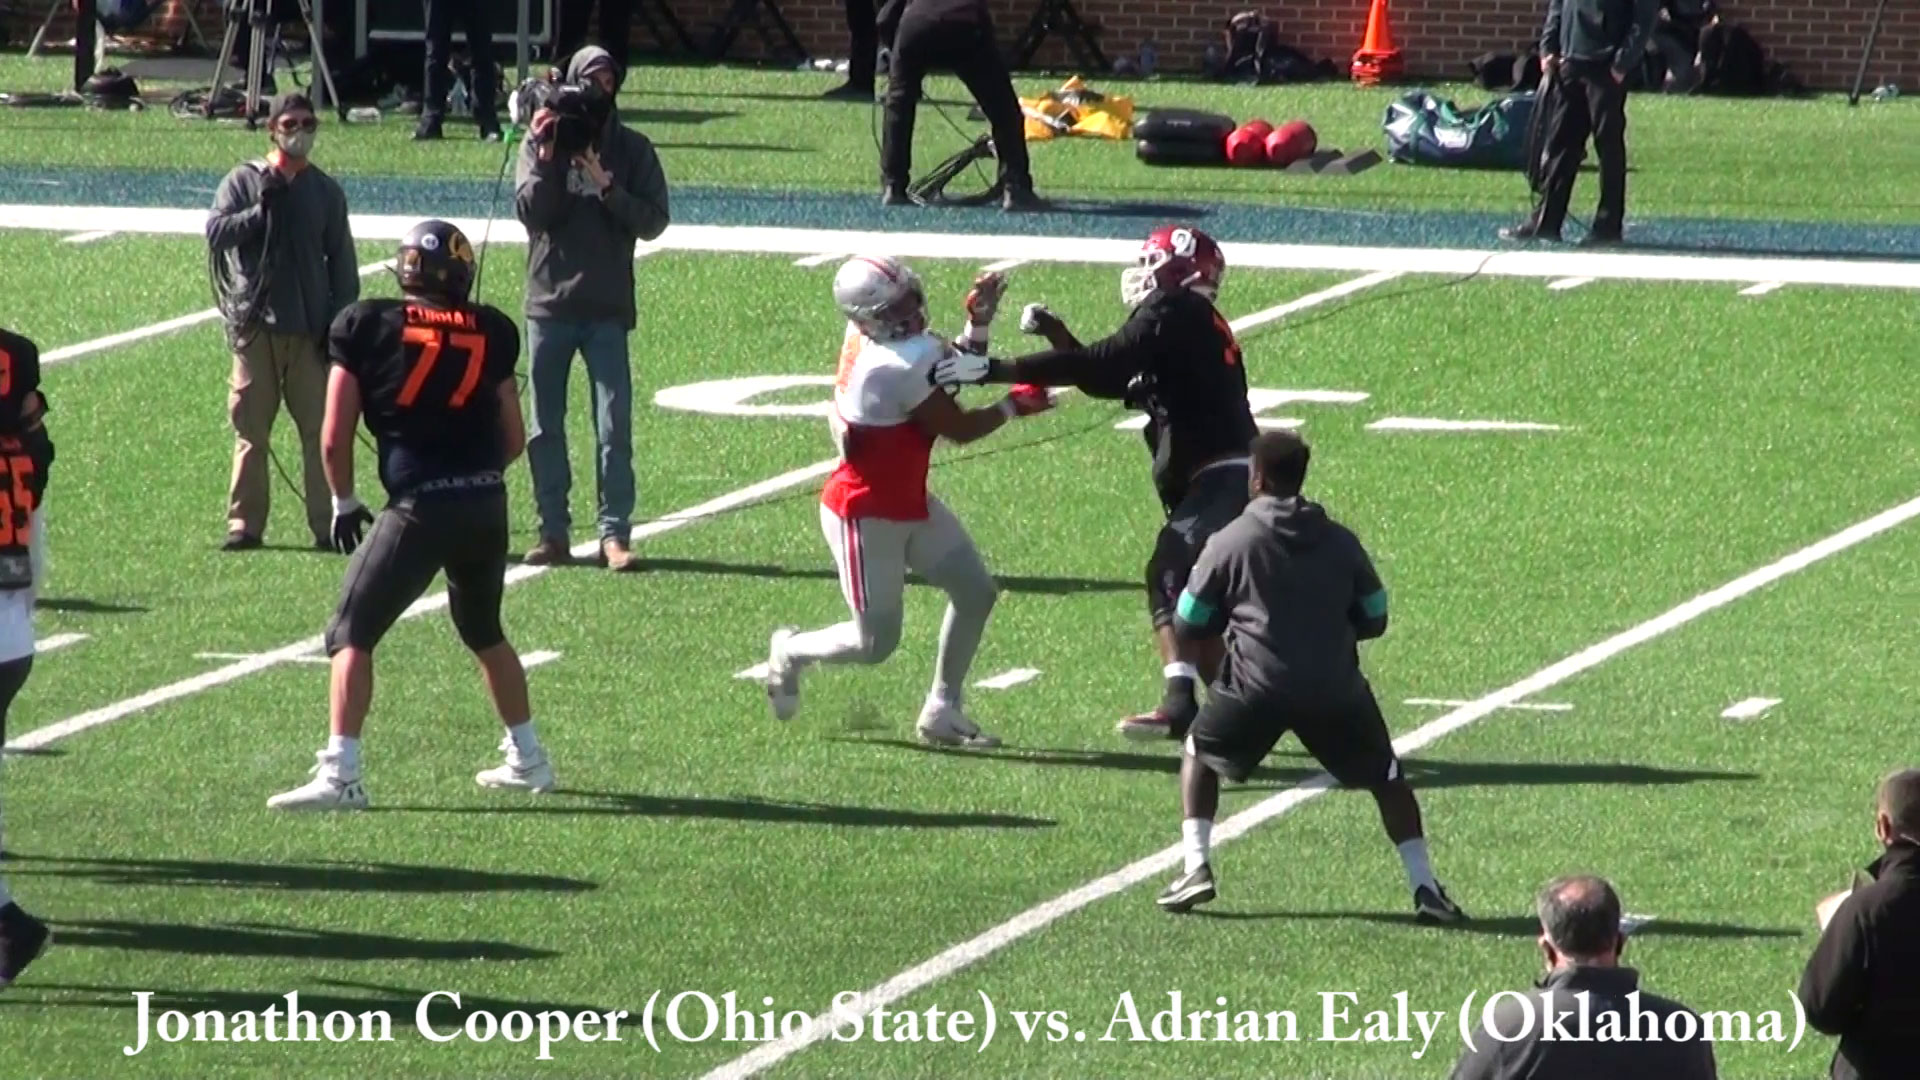 Jonathan Cooper vs. Adrian Ealy